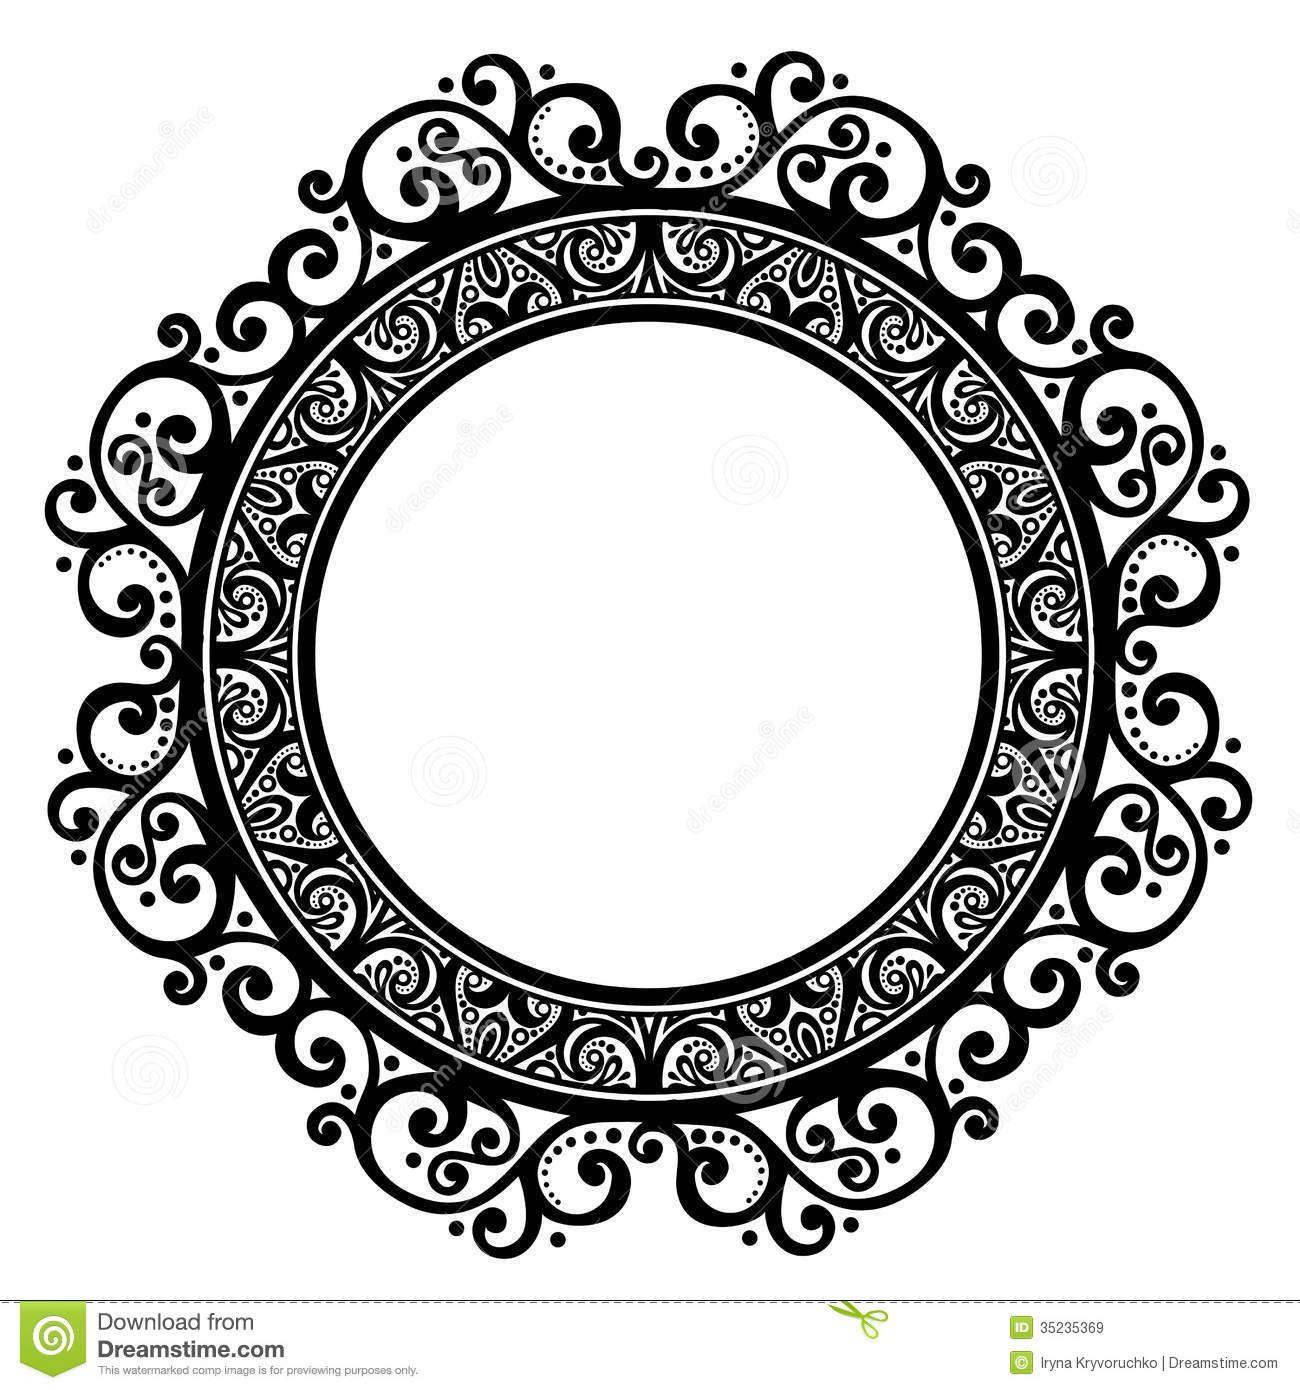 Black Flower Decorative Frame Vectors Material 04 Free: Pin By Shruti Padia On Frame